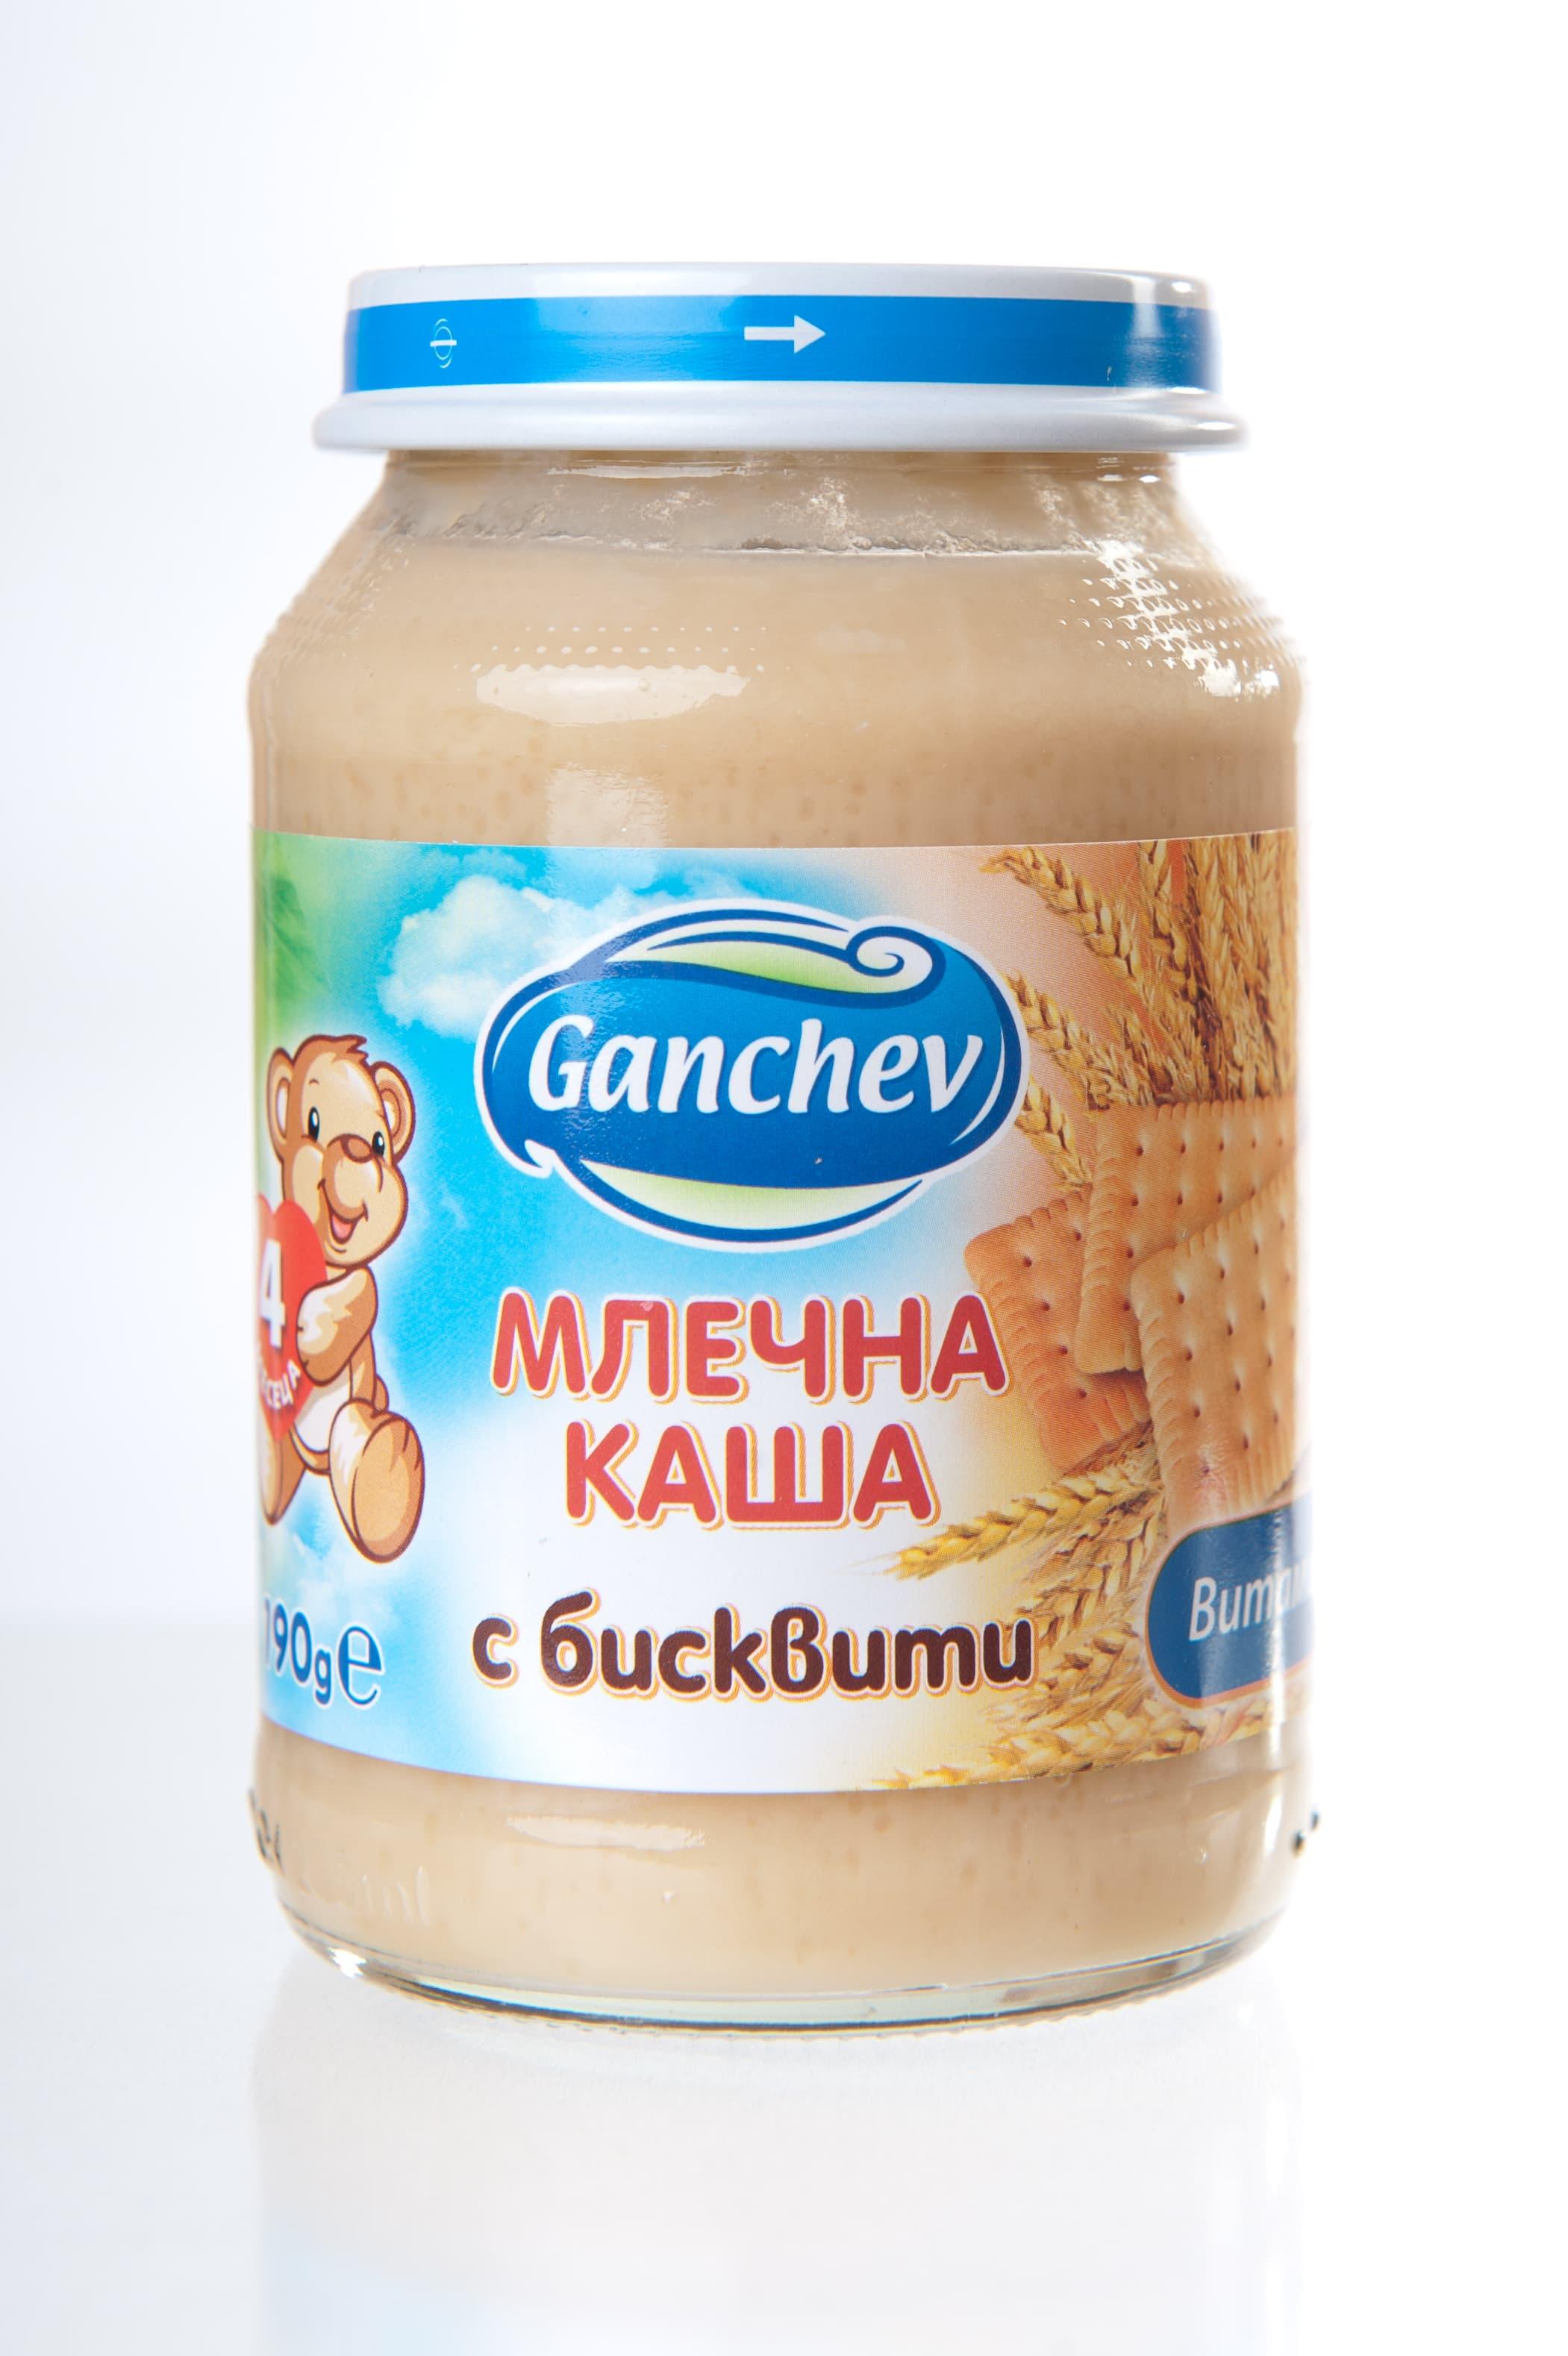 Ganchev-млечна каша с бисквити 4м+190гр